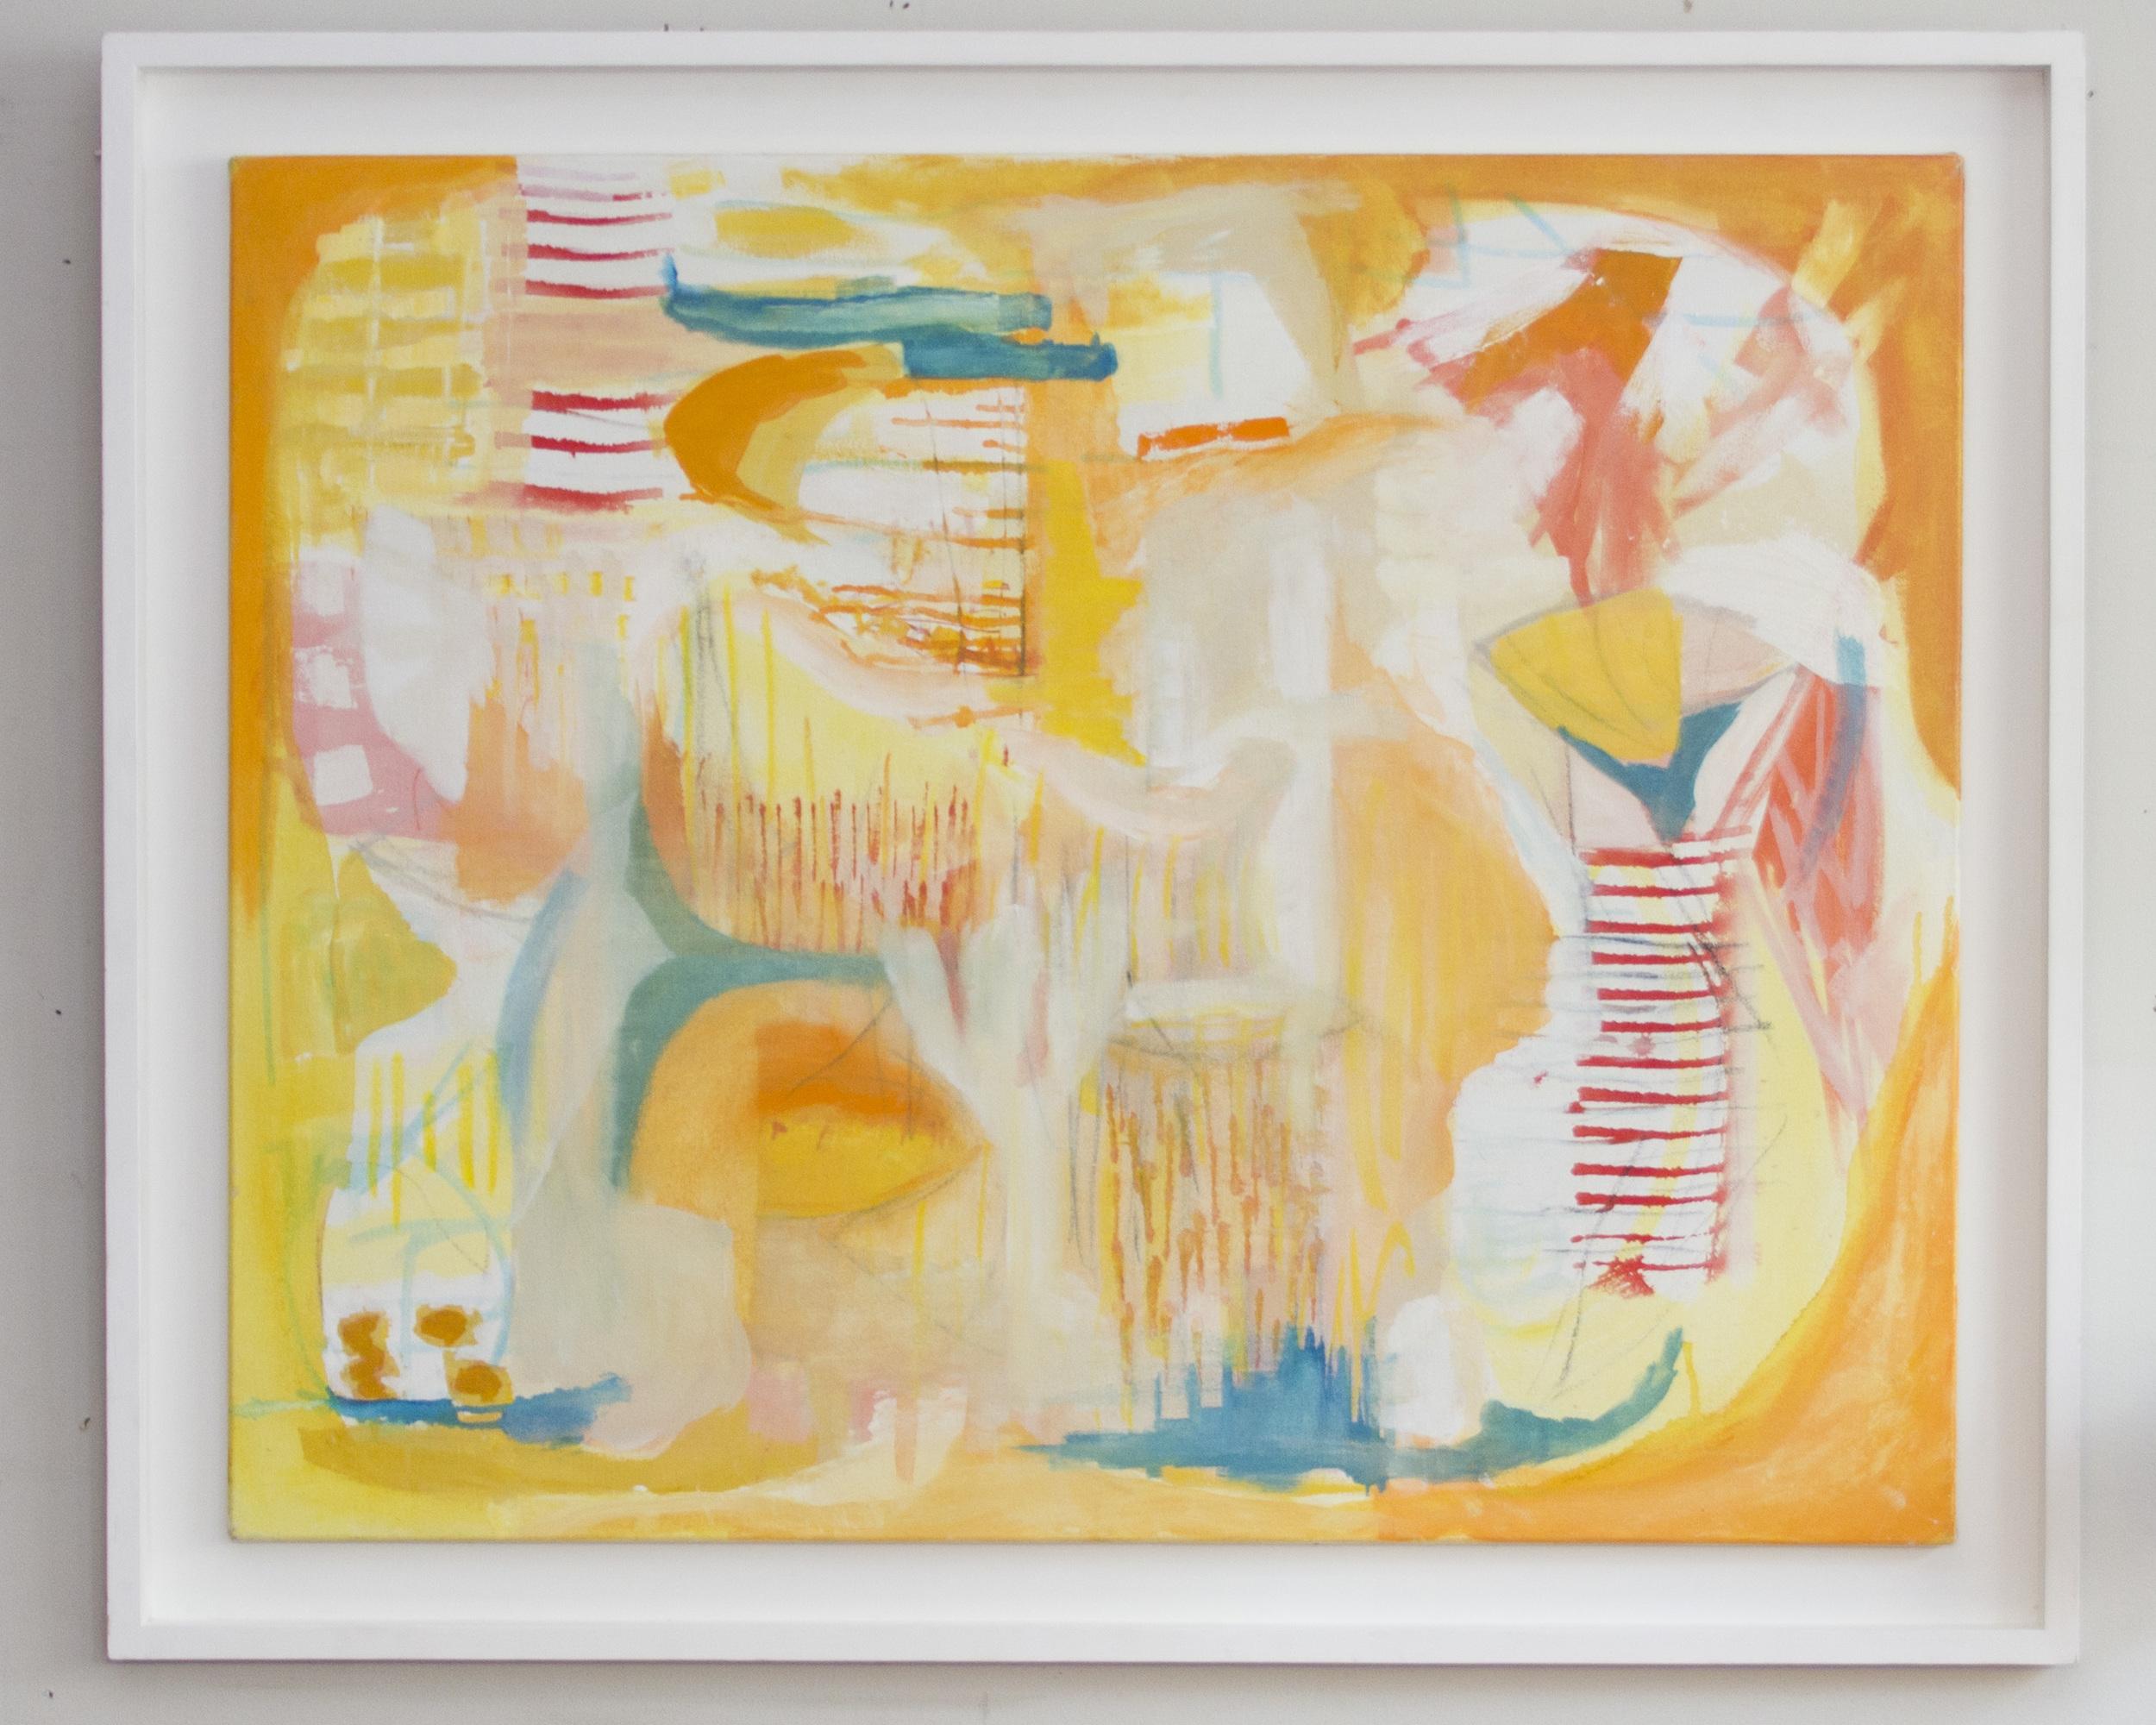 Original Painting by David Harkins £750